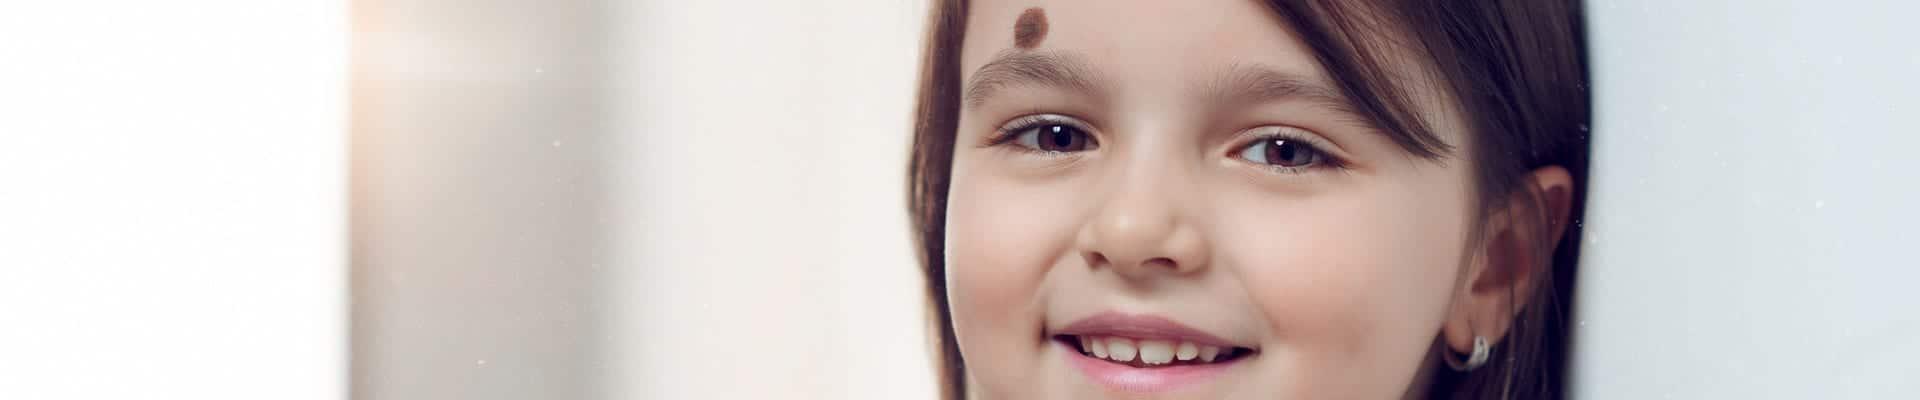 Birthmark Removal Mountain View - Hemangiomas Treatment